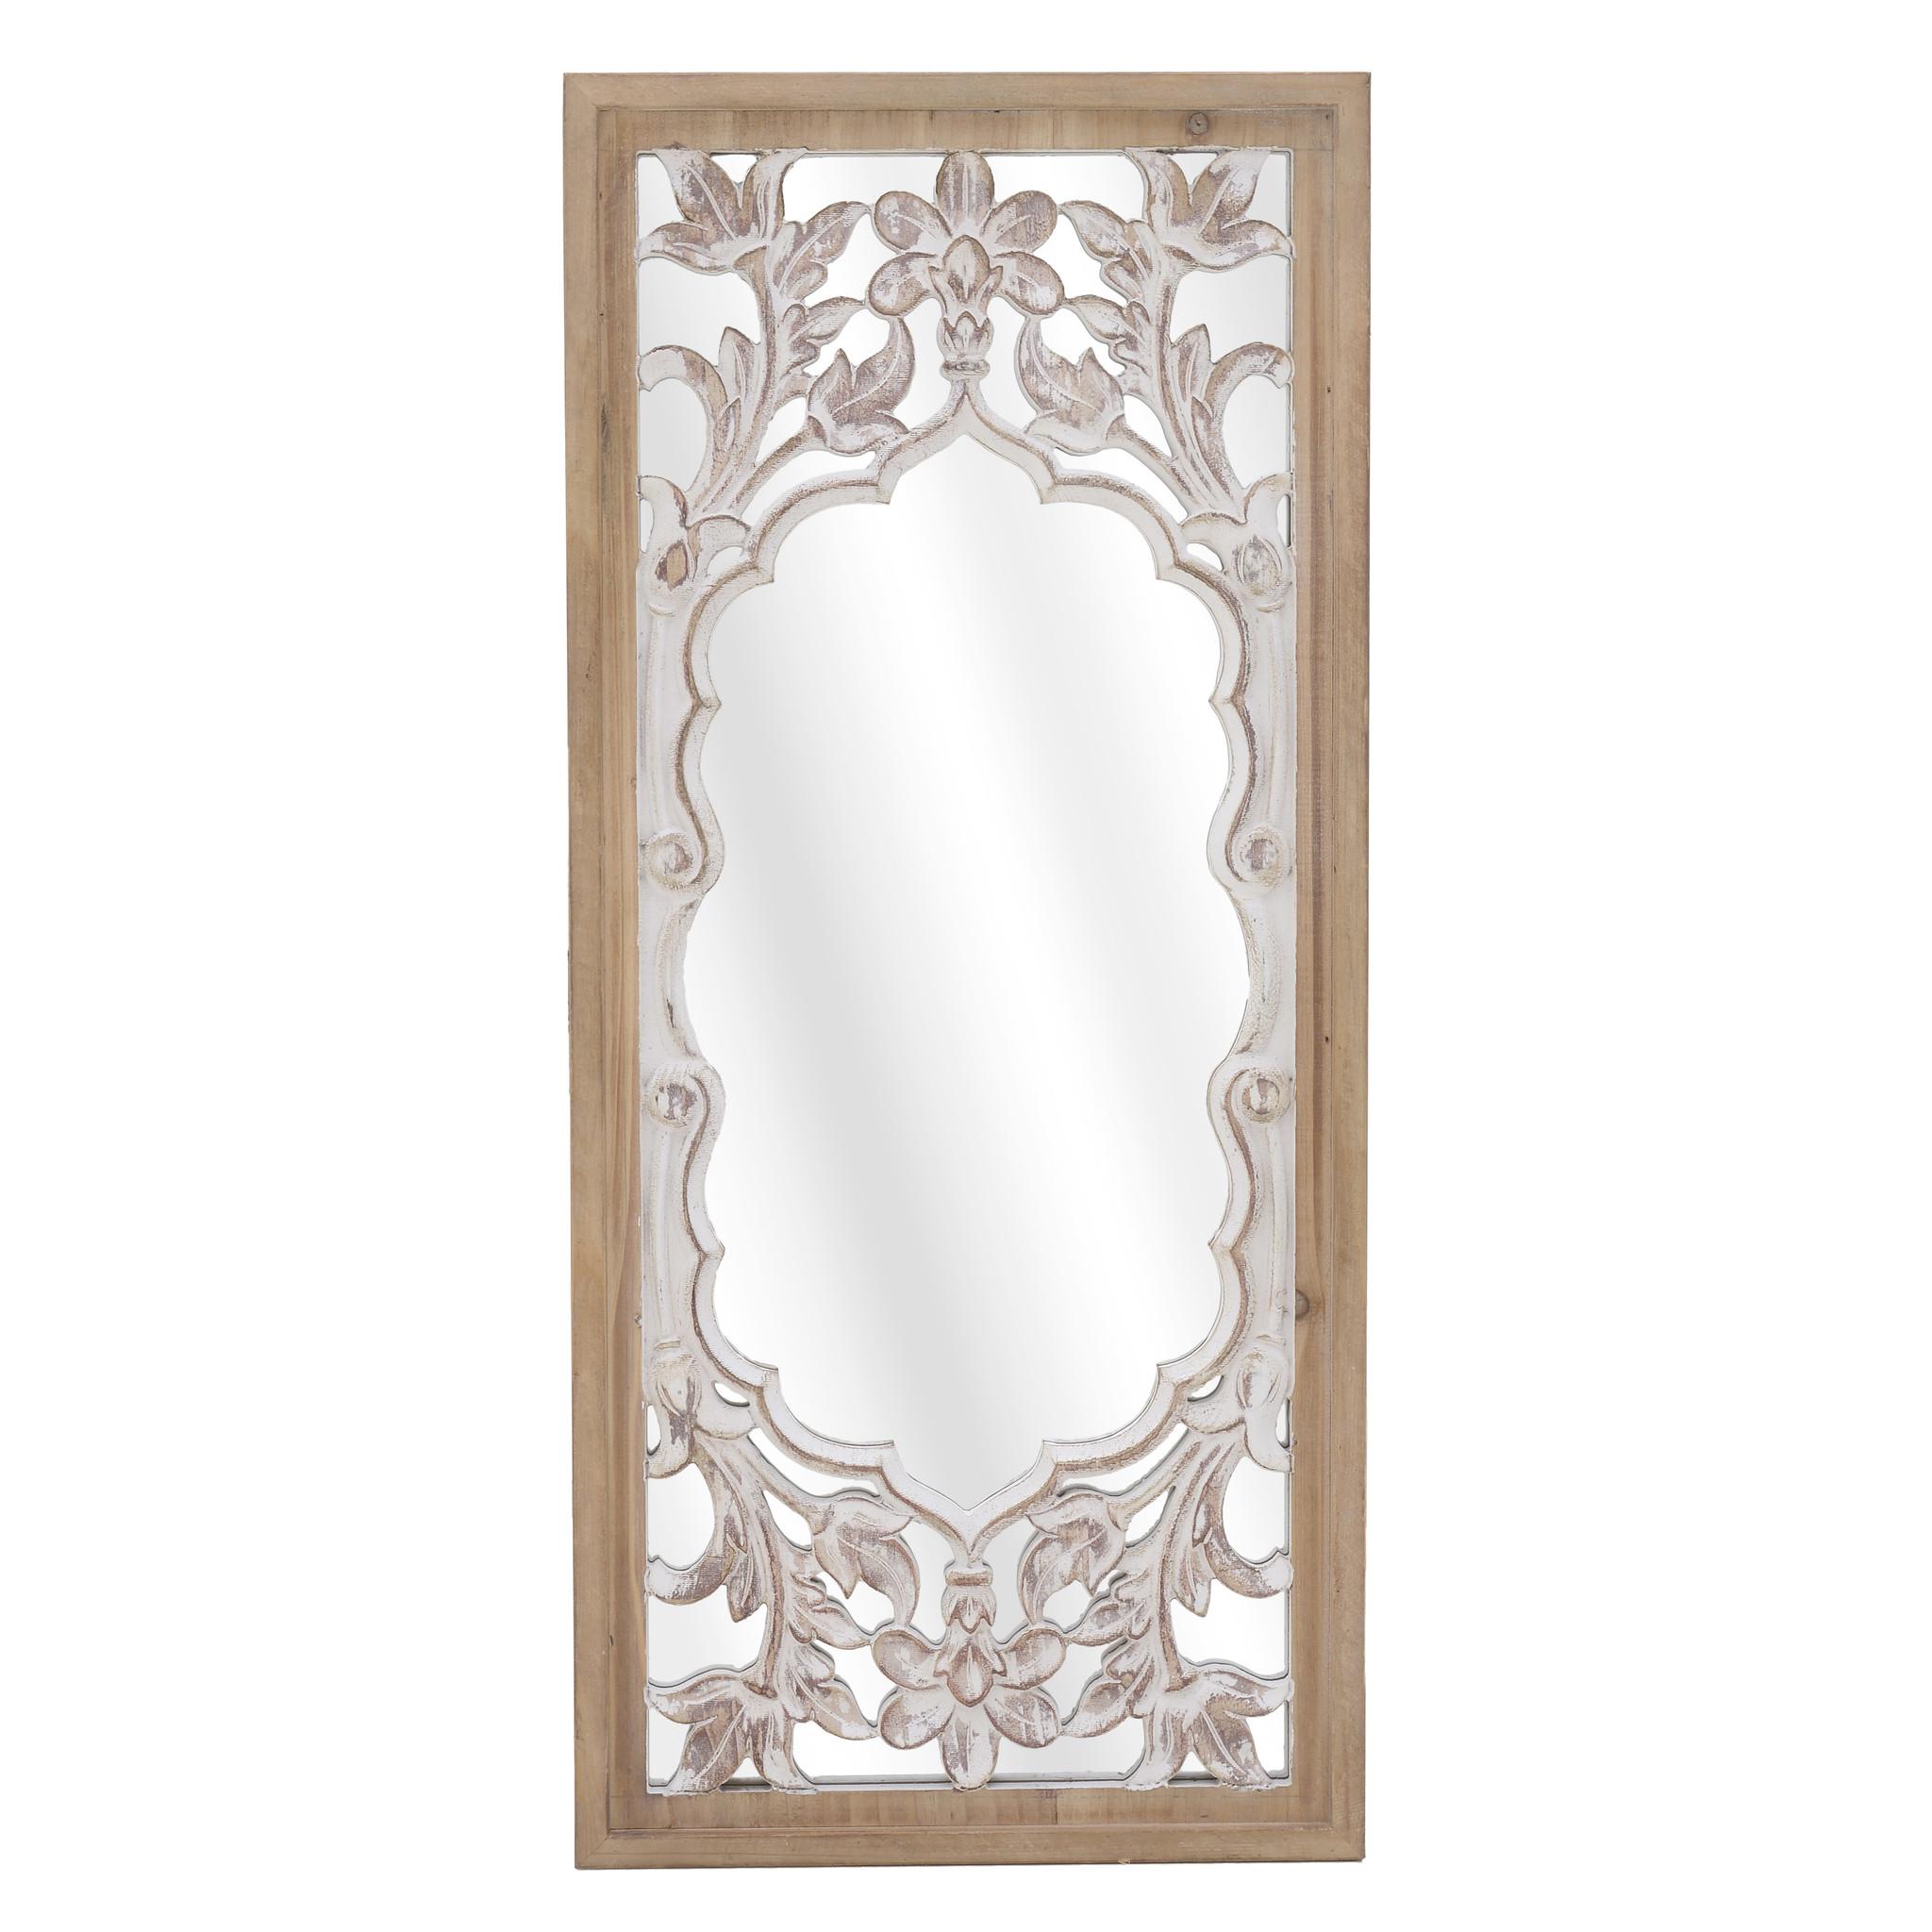 Зеркало настенное lethyn (to4rooms) бежевый 32x72x3 см.